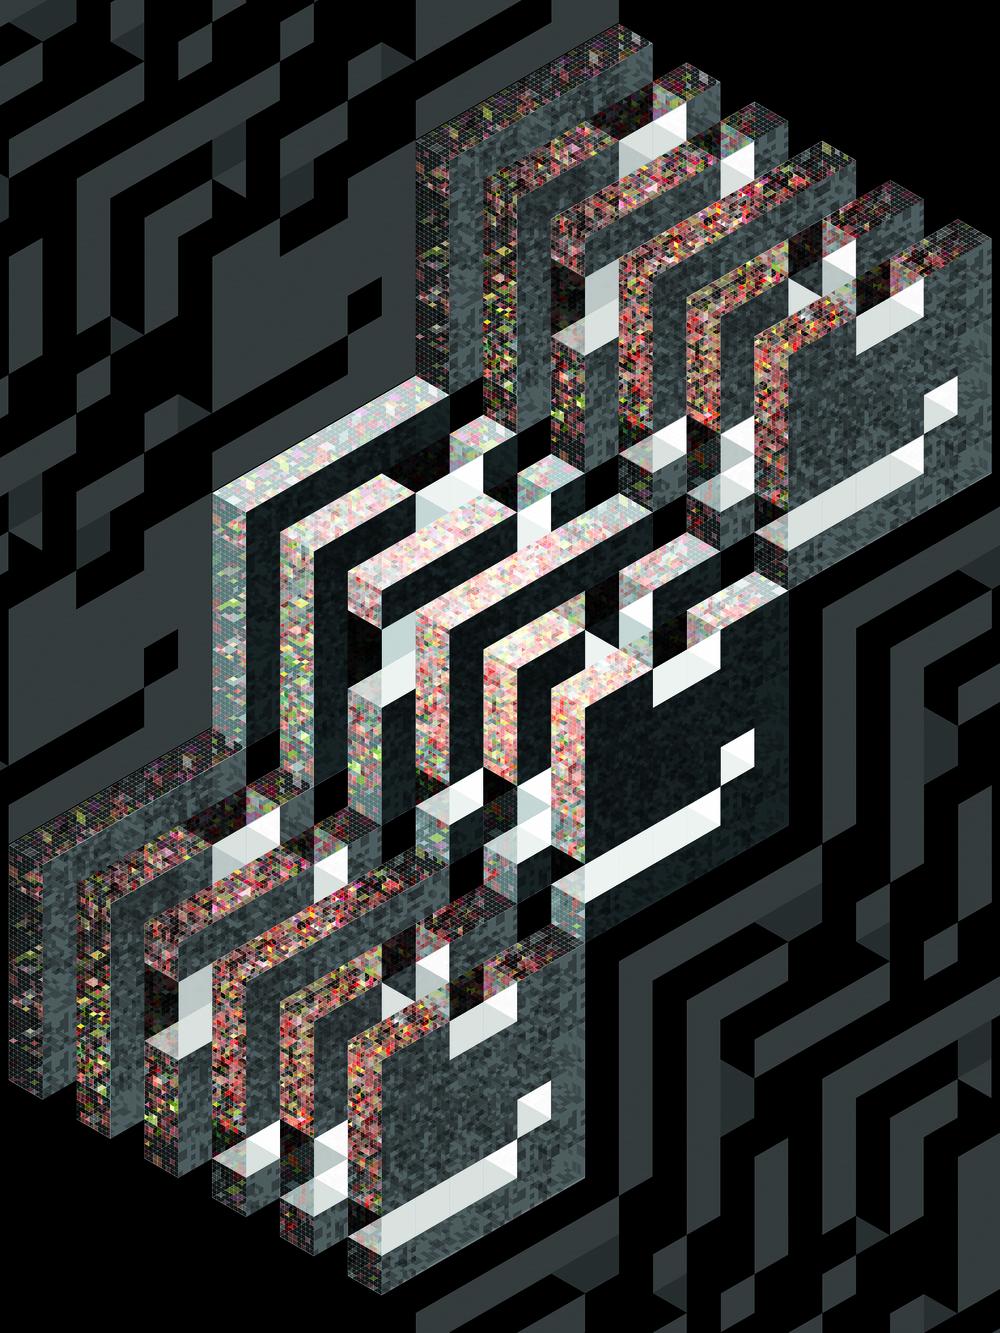 Contour_Original_Overlay_Flat_Graphic_Black_Adjust_LATEST.jpg